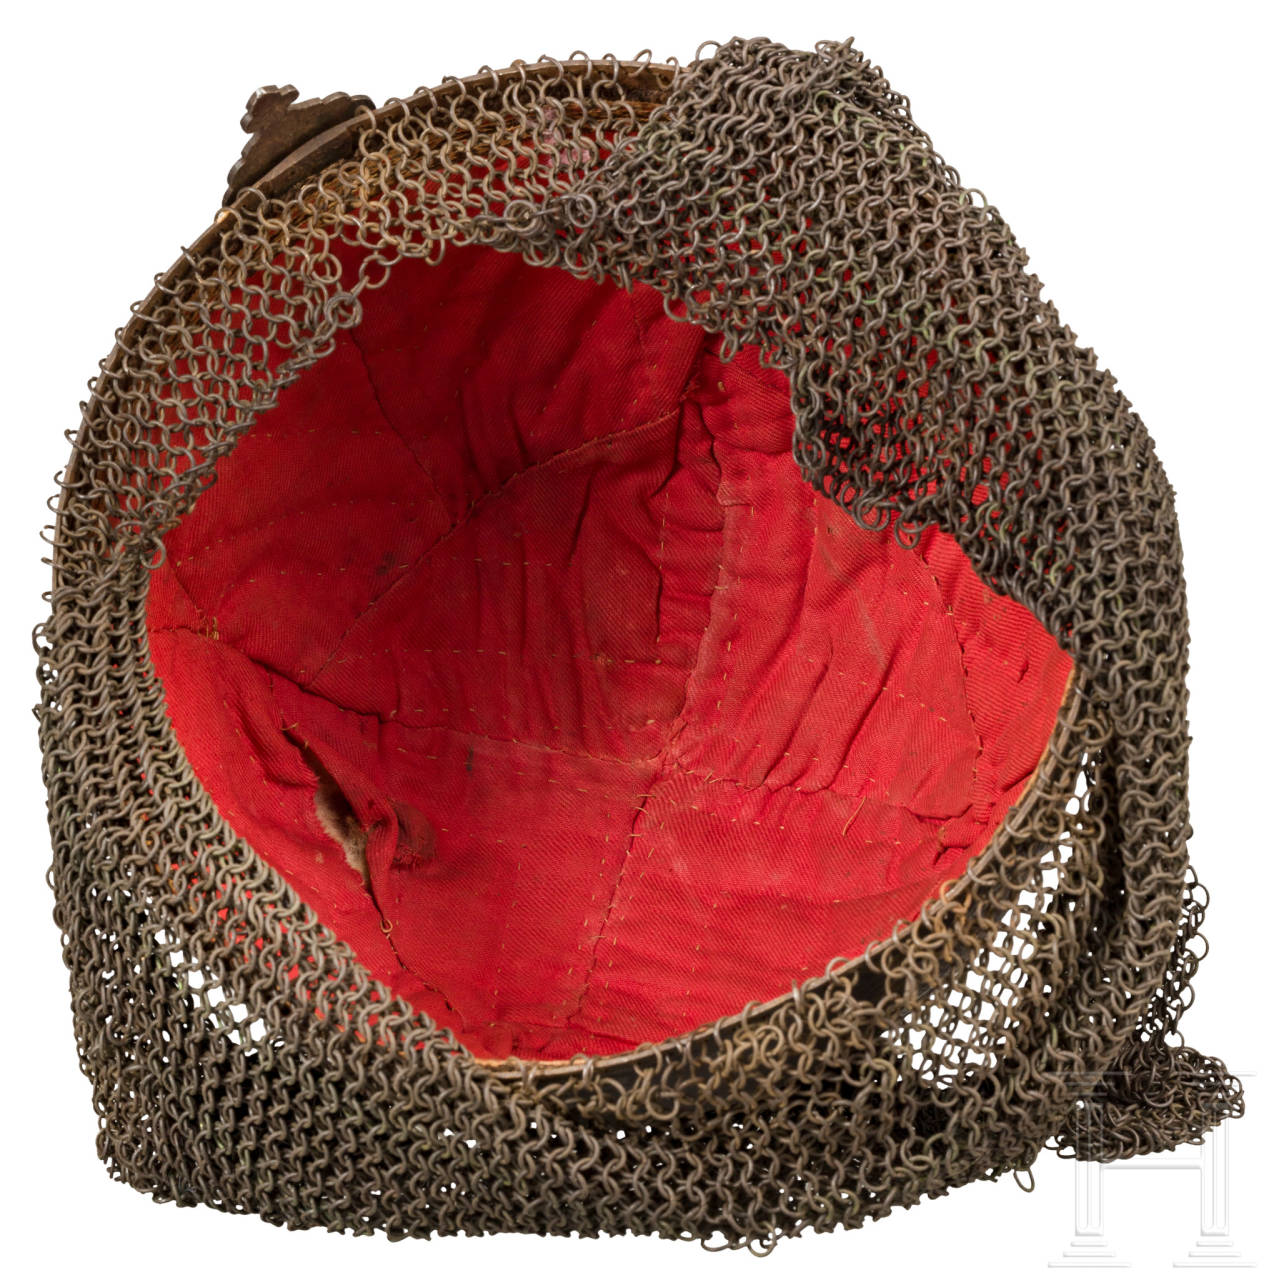 Geschnittener, goldtauschierter Helm (Kulah Khud), Persien, 19. Jhdt.